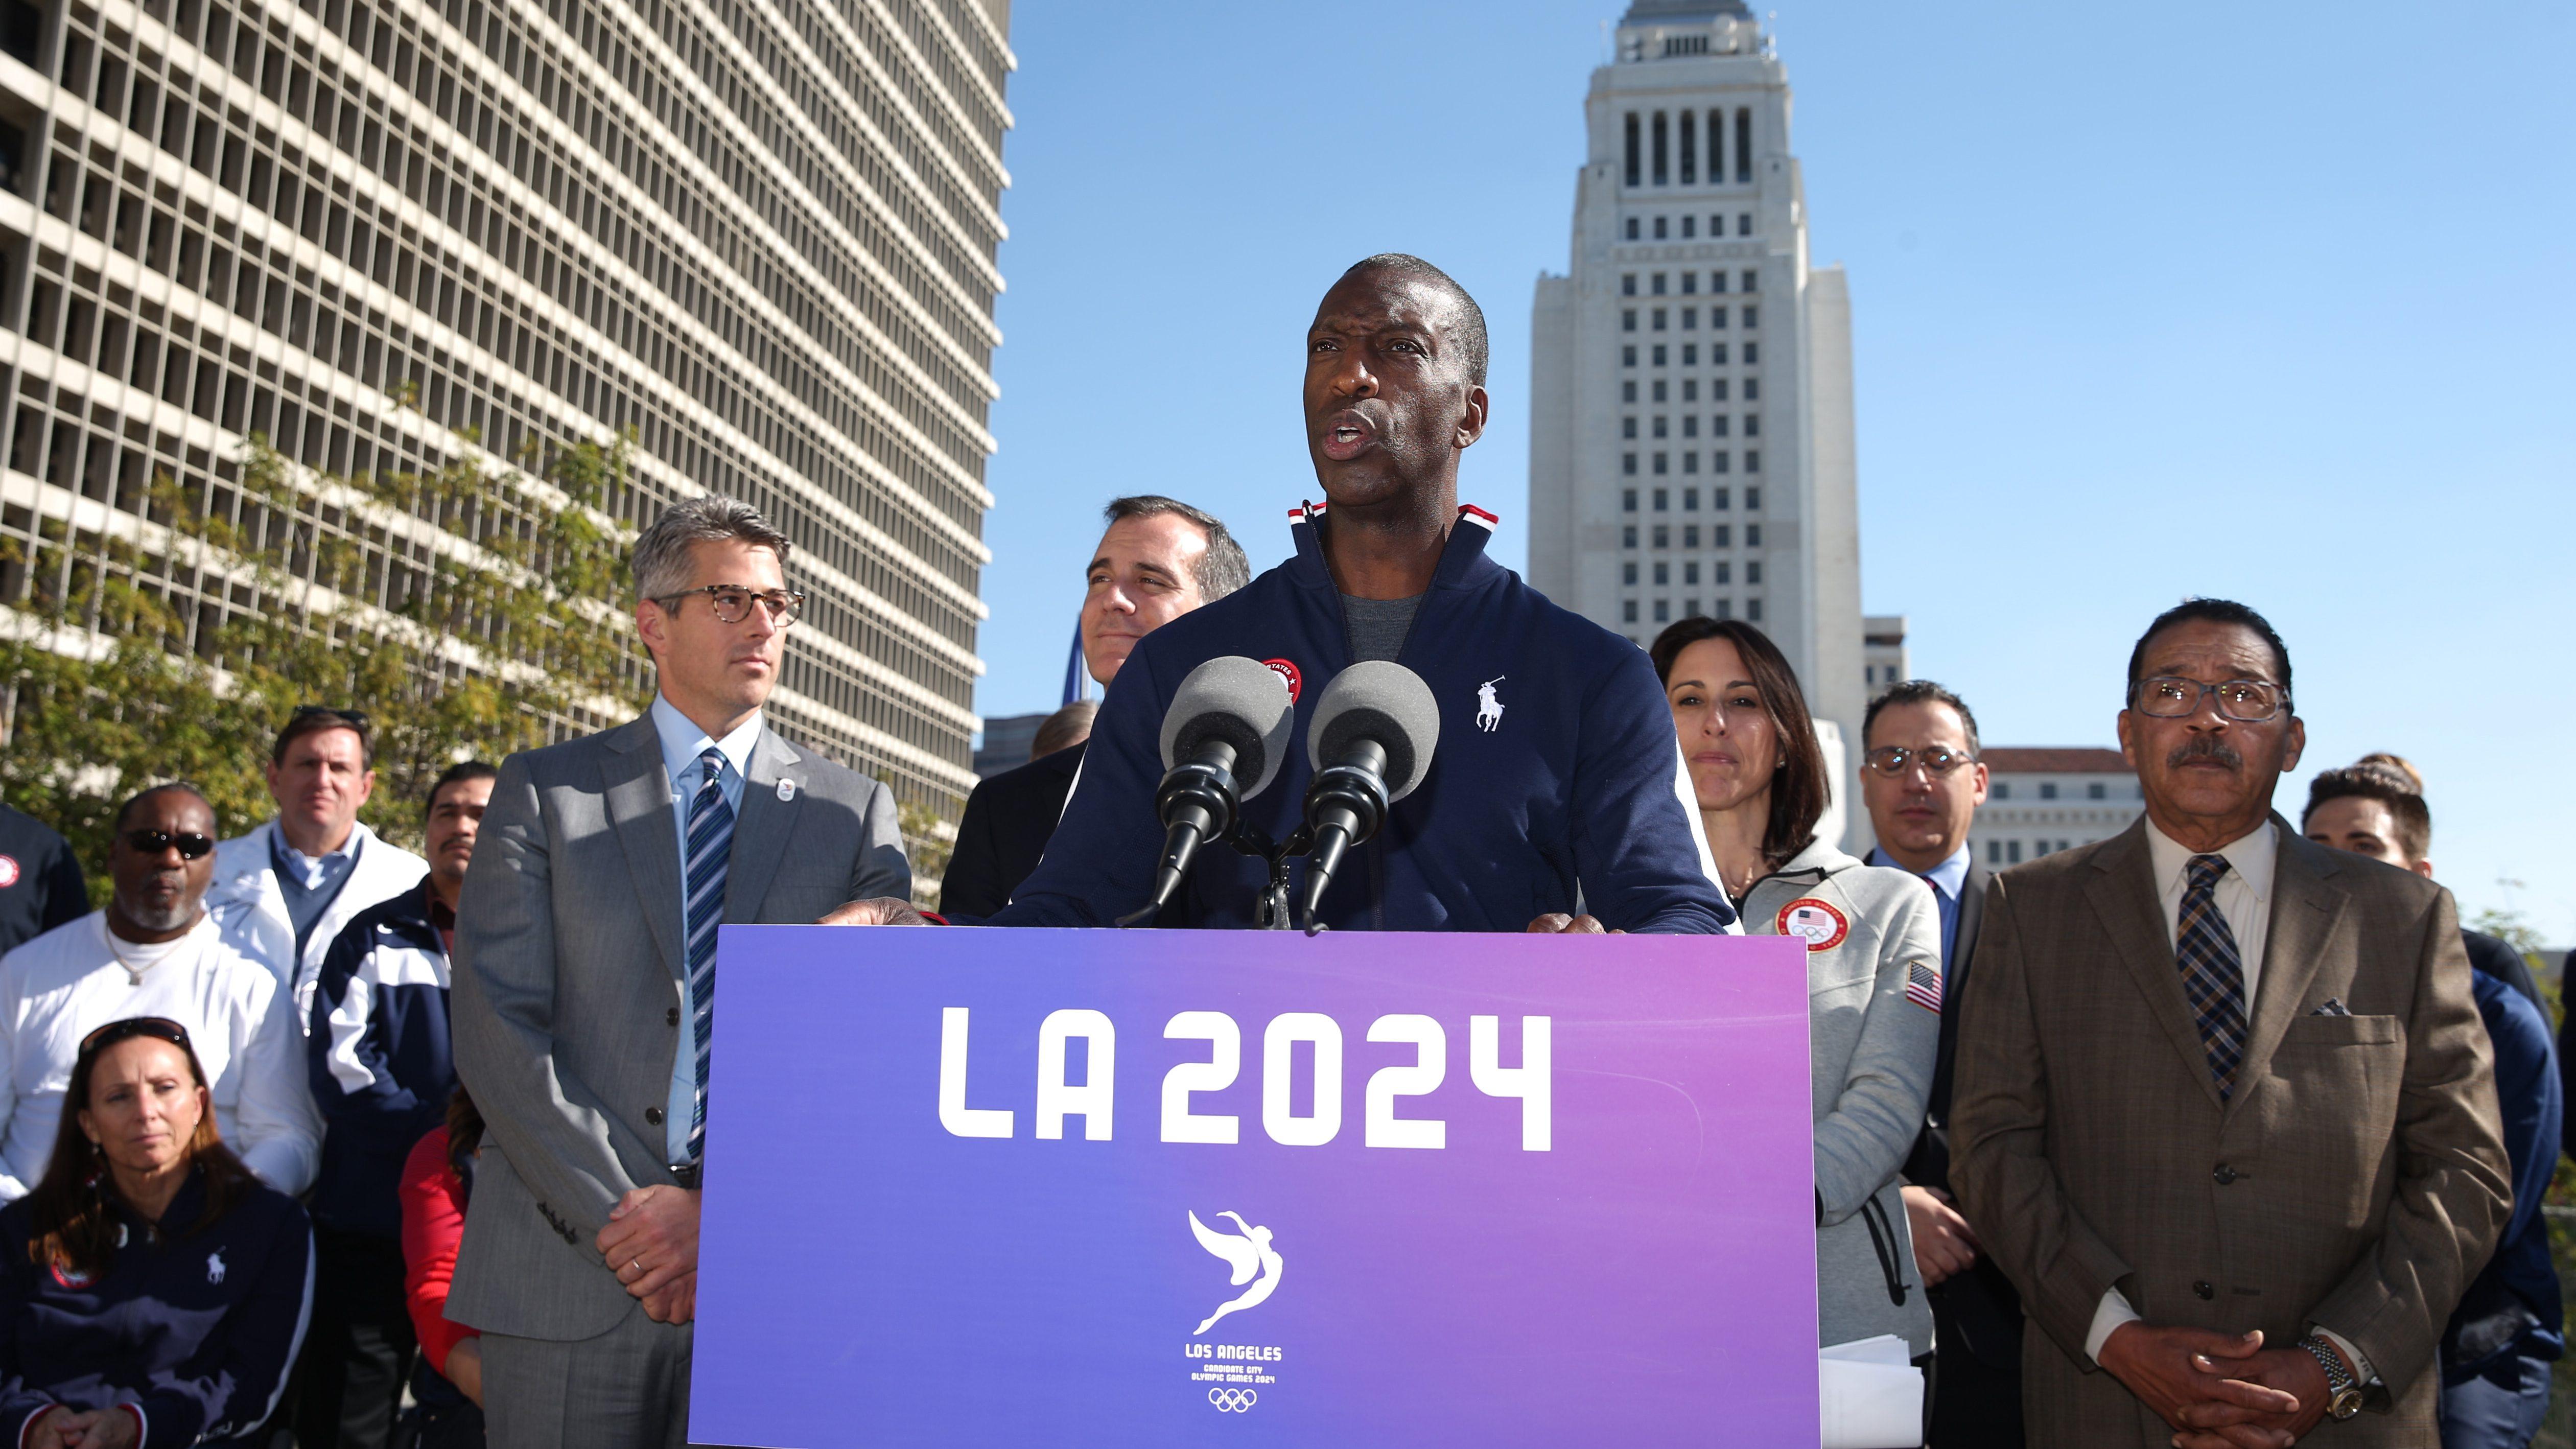 Michael Johnson at LA 2024 Olympics bid opening